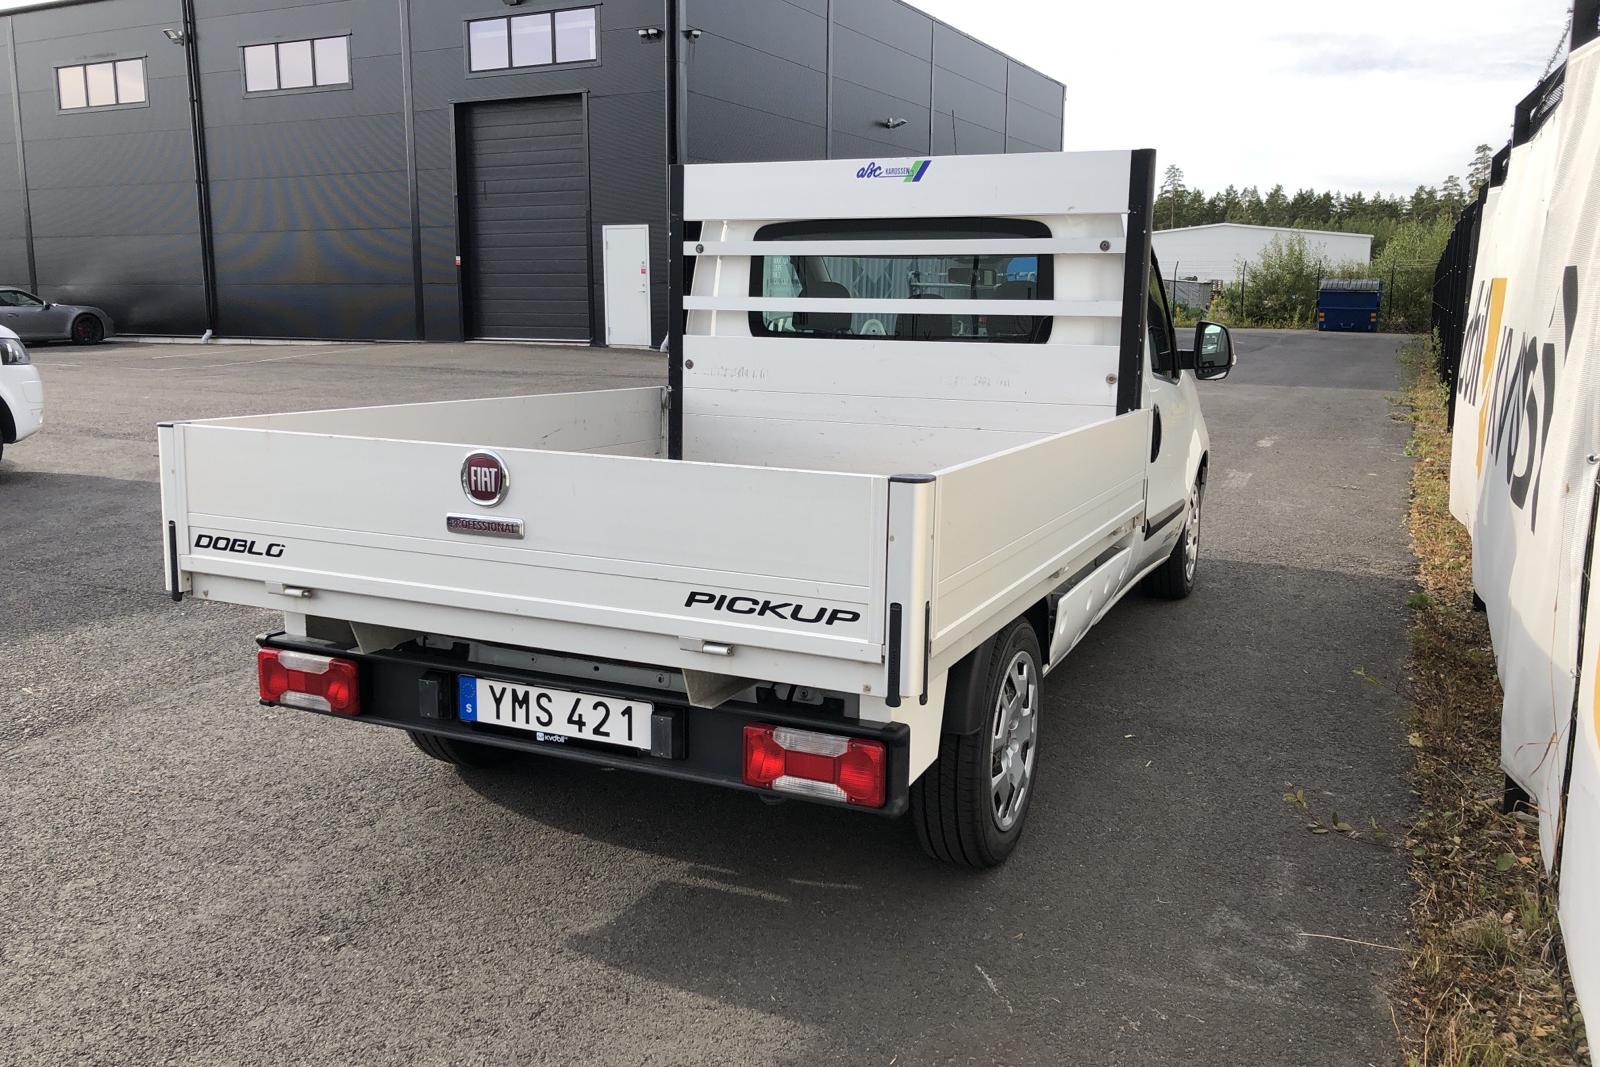 Fiat Doblo Work Up 1.6 MJT (105hk) - 4 054 mil - Manuell - vit - 2018